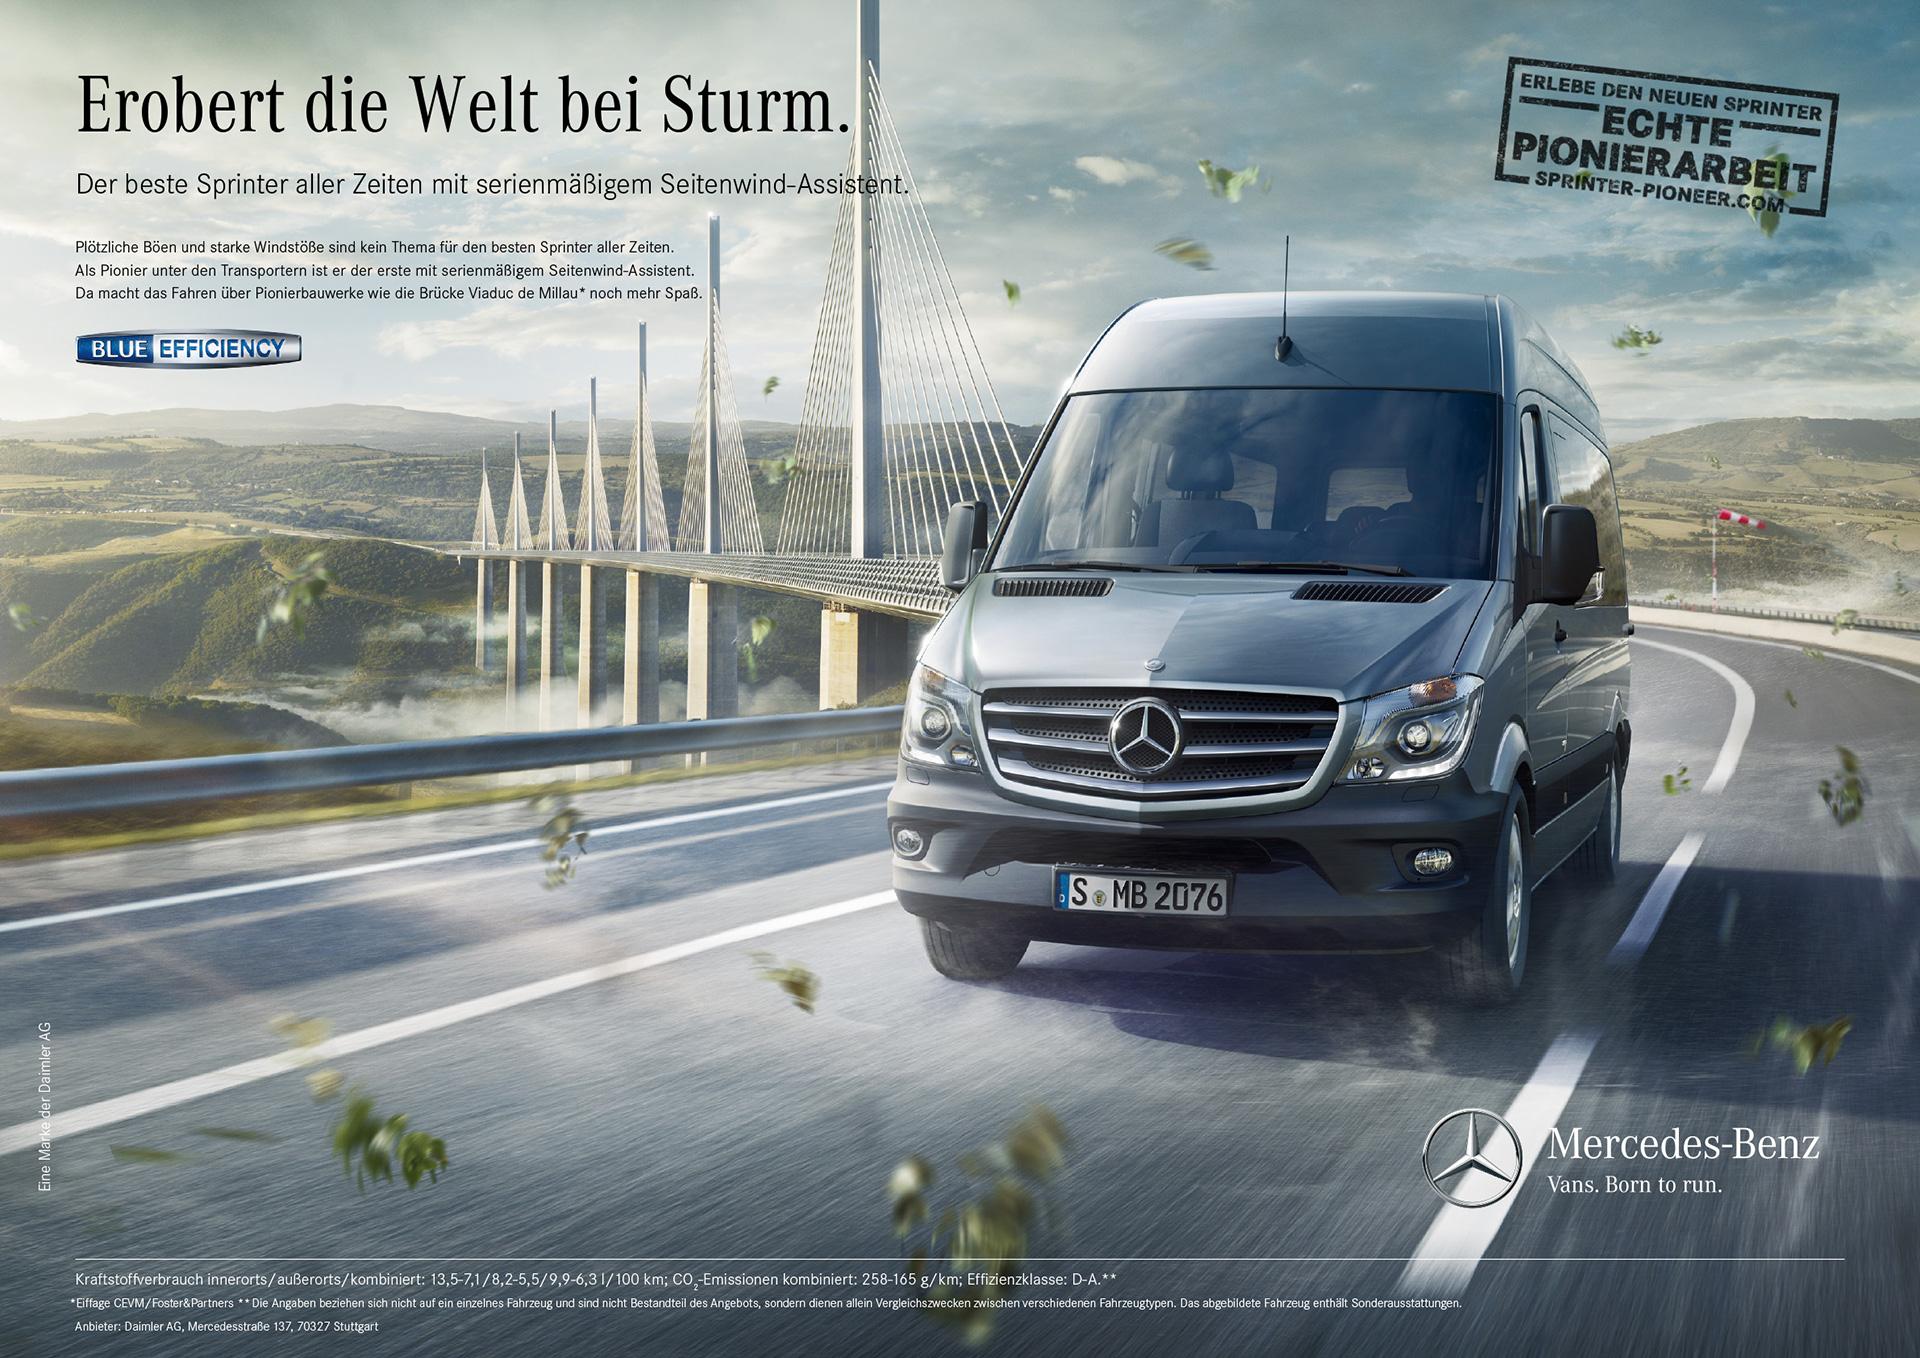 Kerstin_Correll_Mercedes-Benz_Sprinter_Pioneer_04